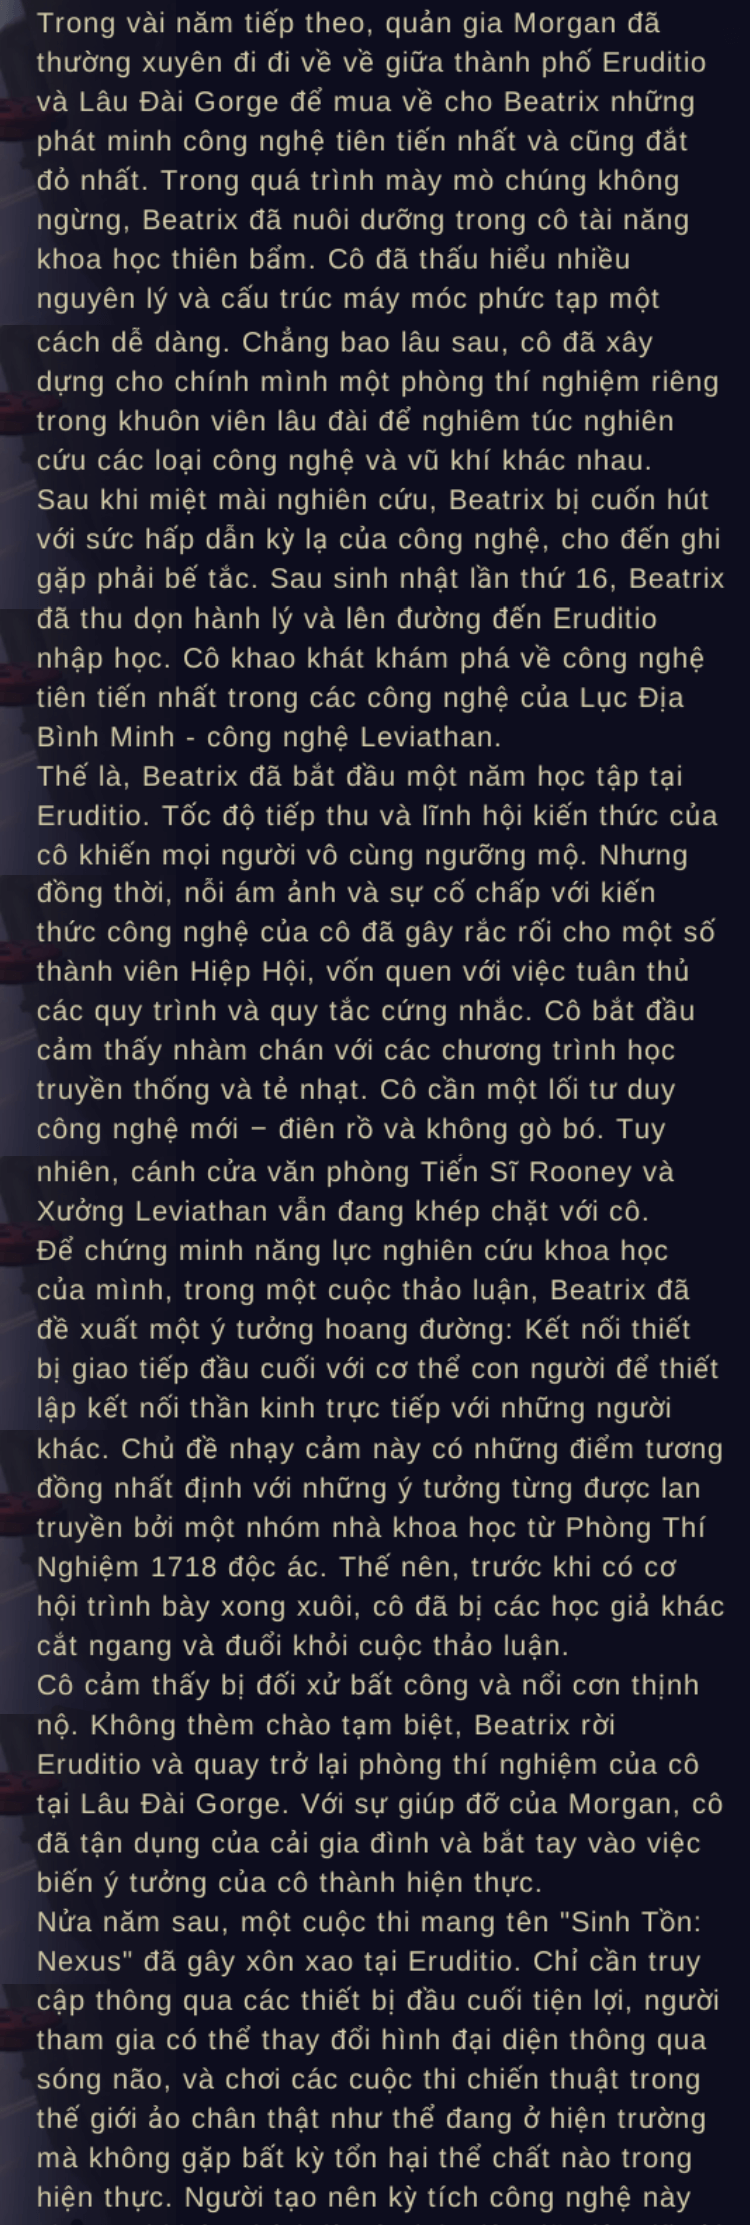 Tiểu sử Beatrix